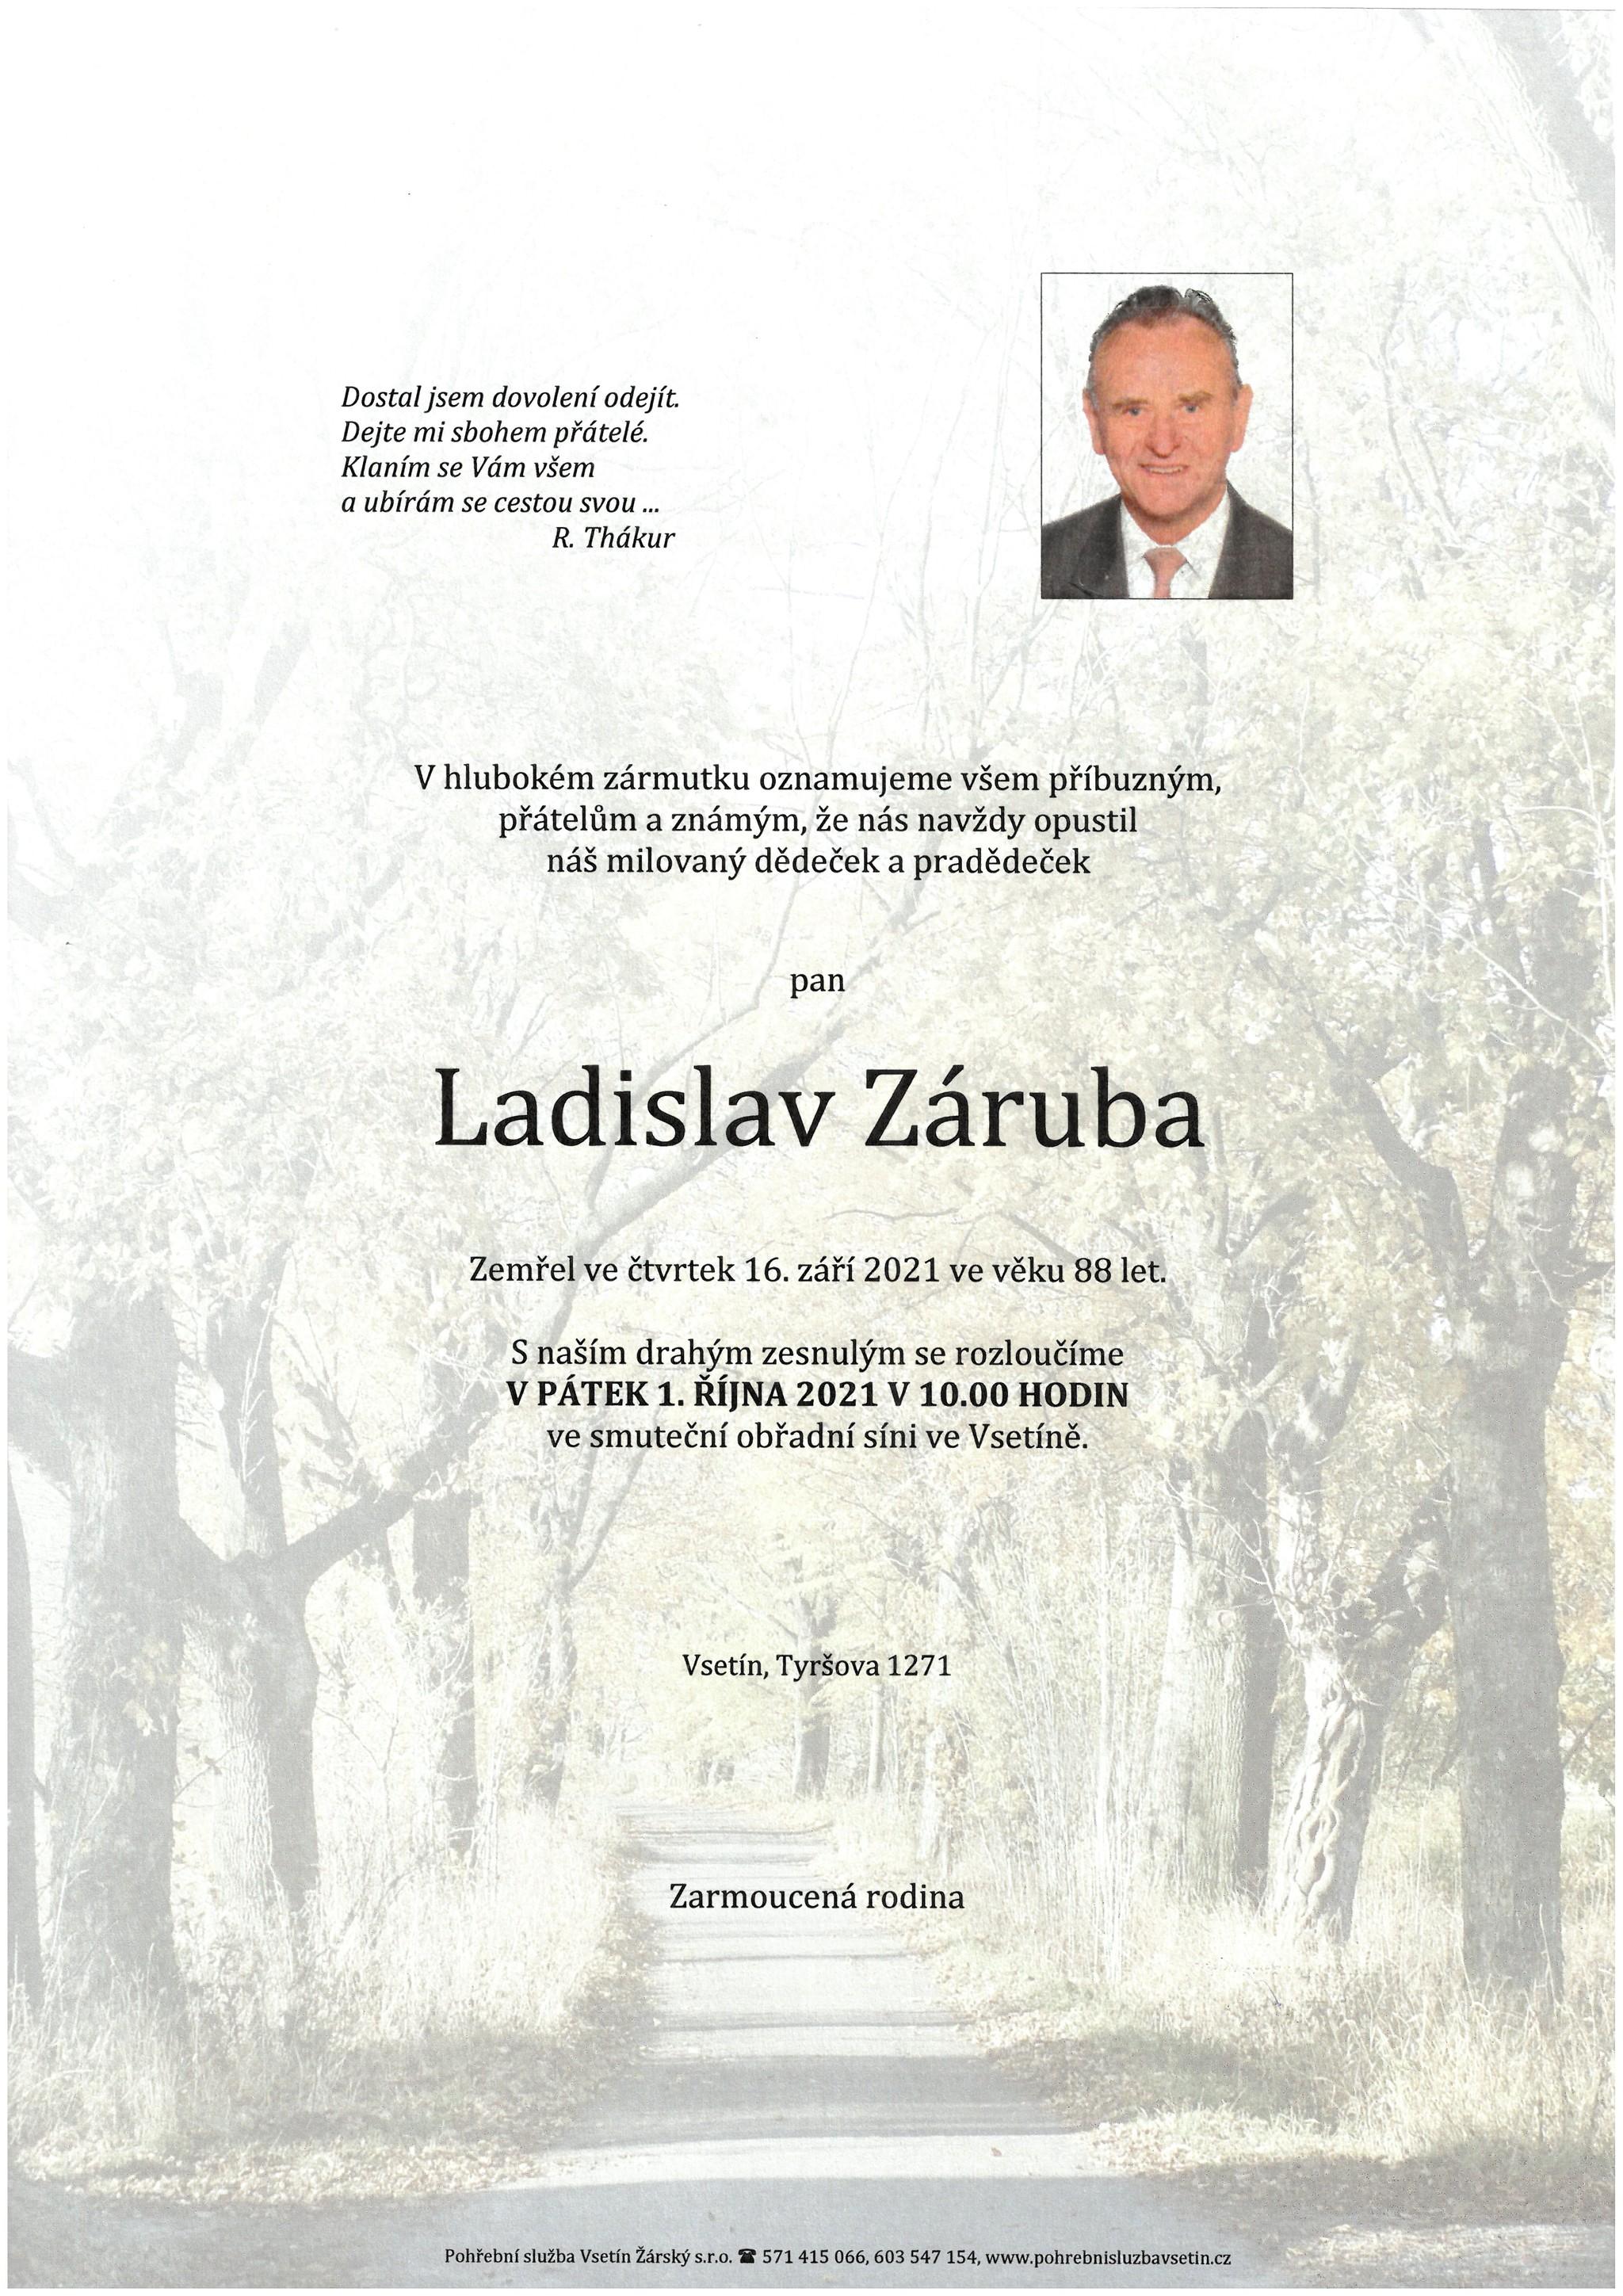 Ladislav Záruba